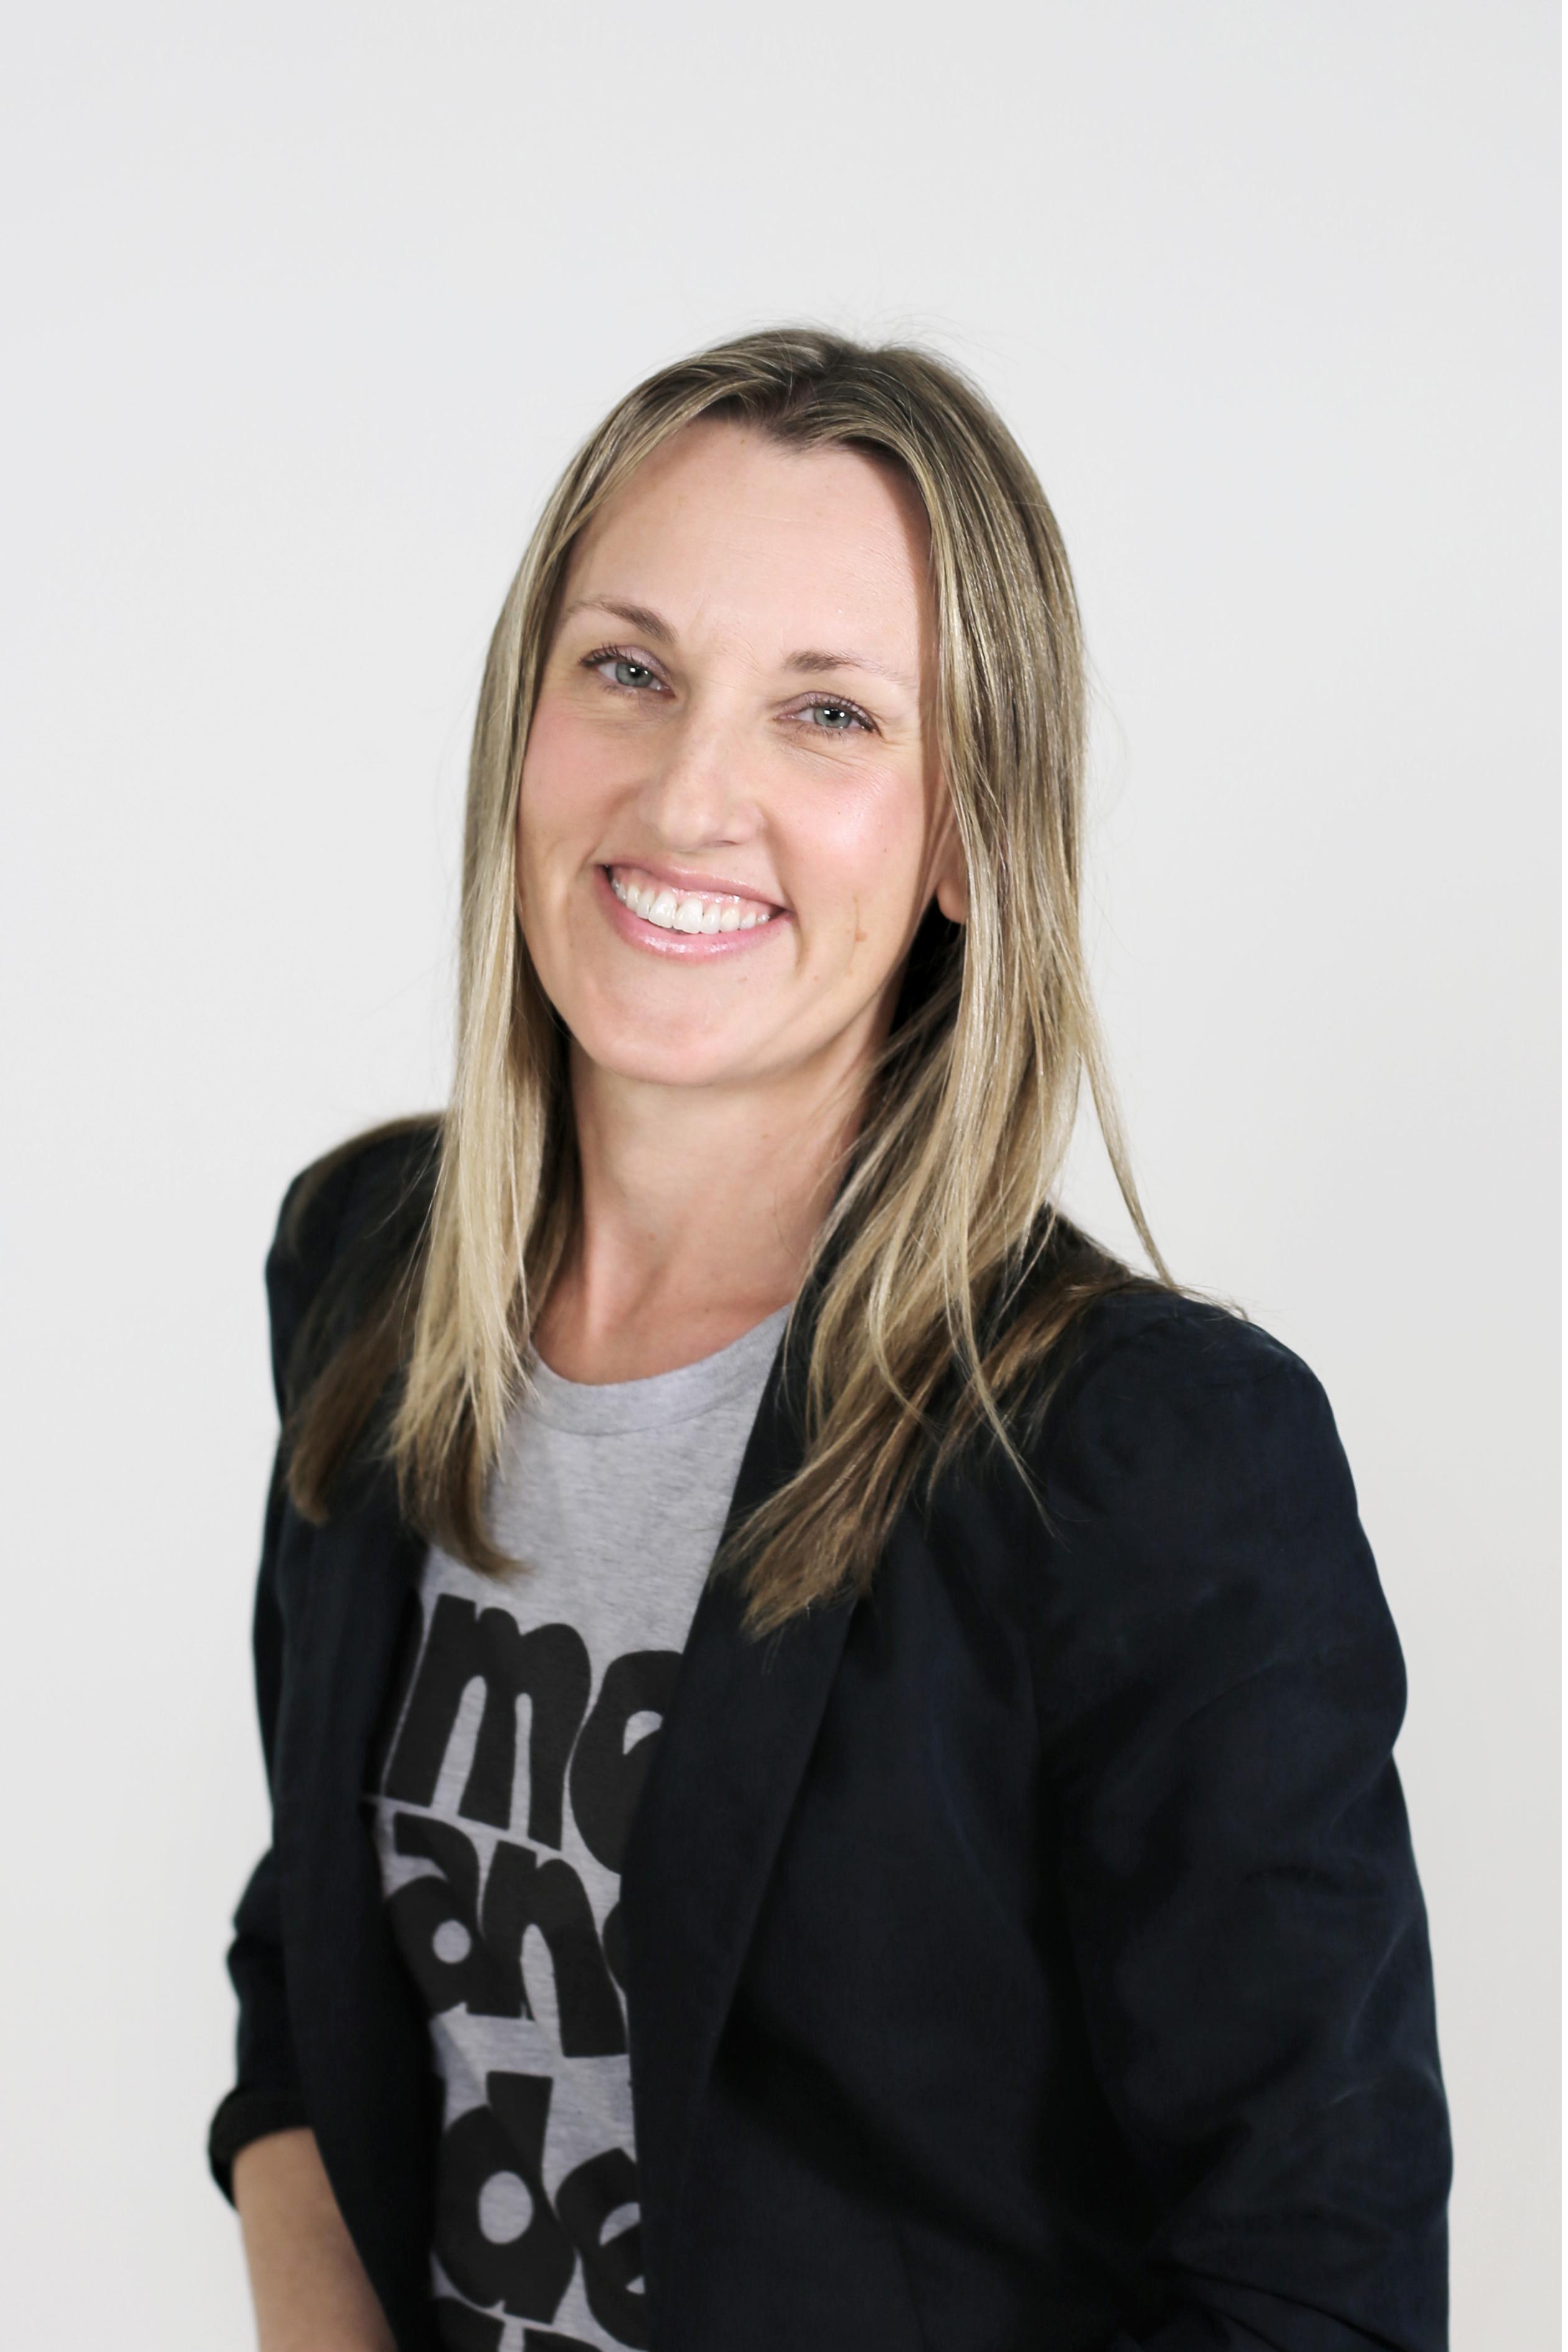 Jill Burgeson